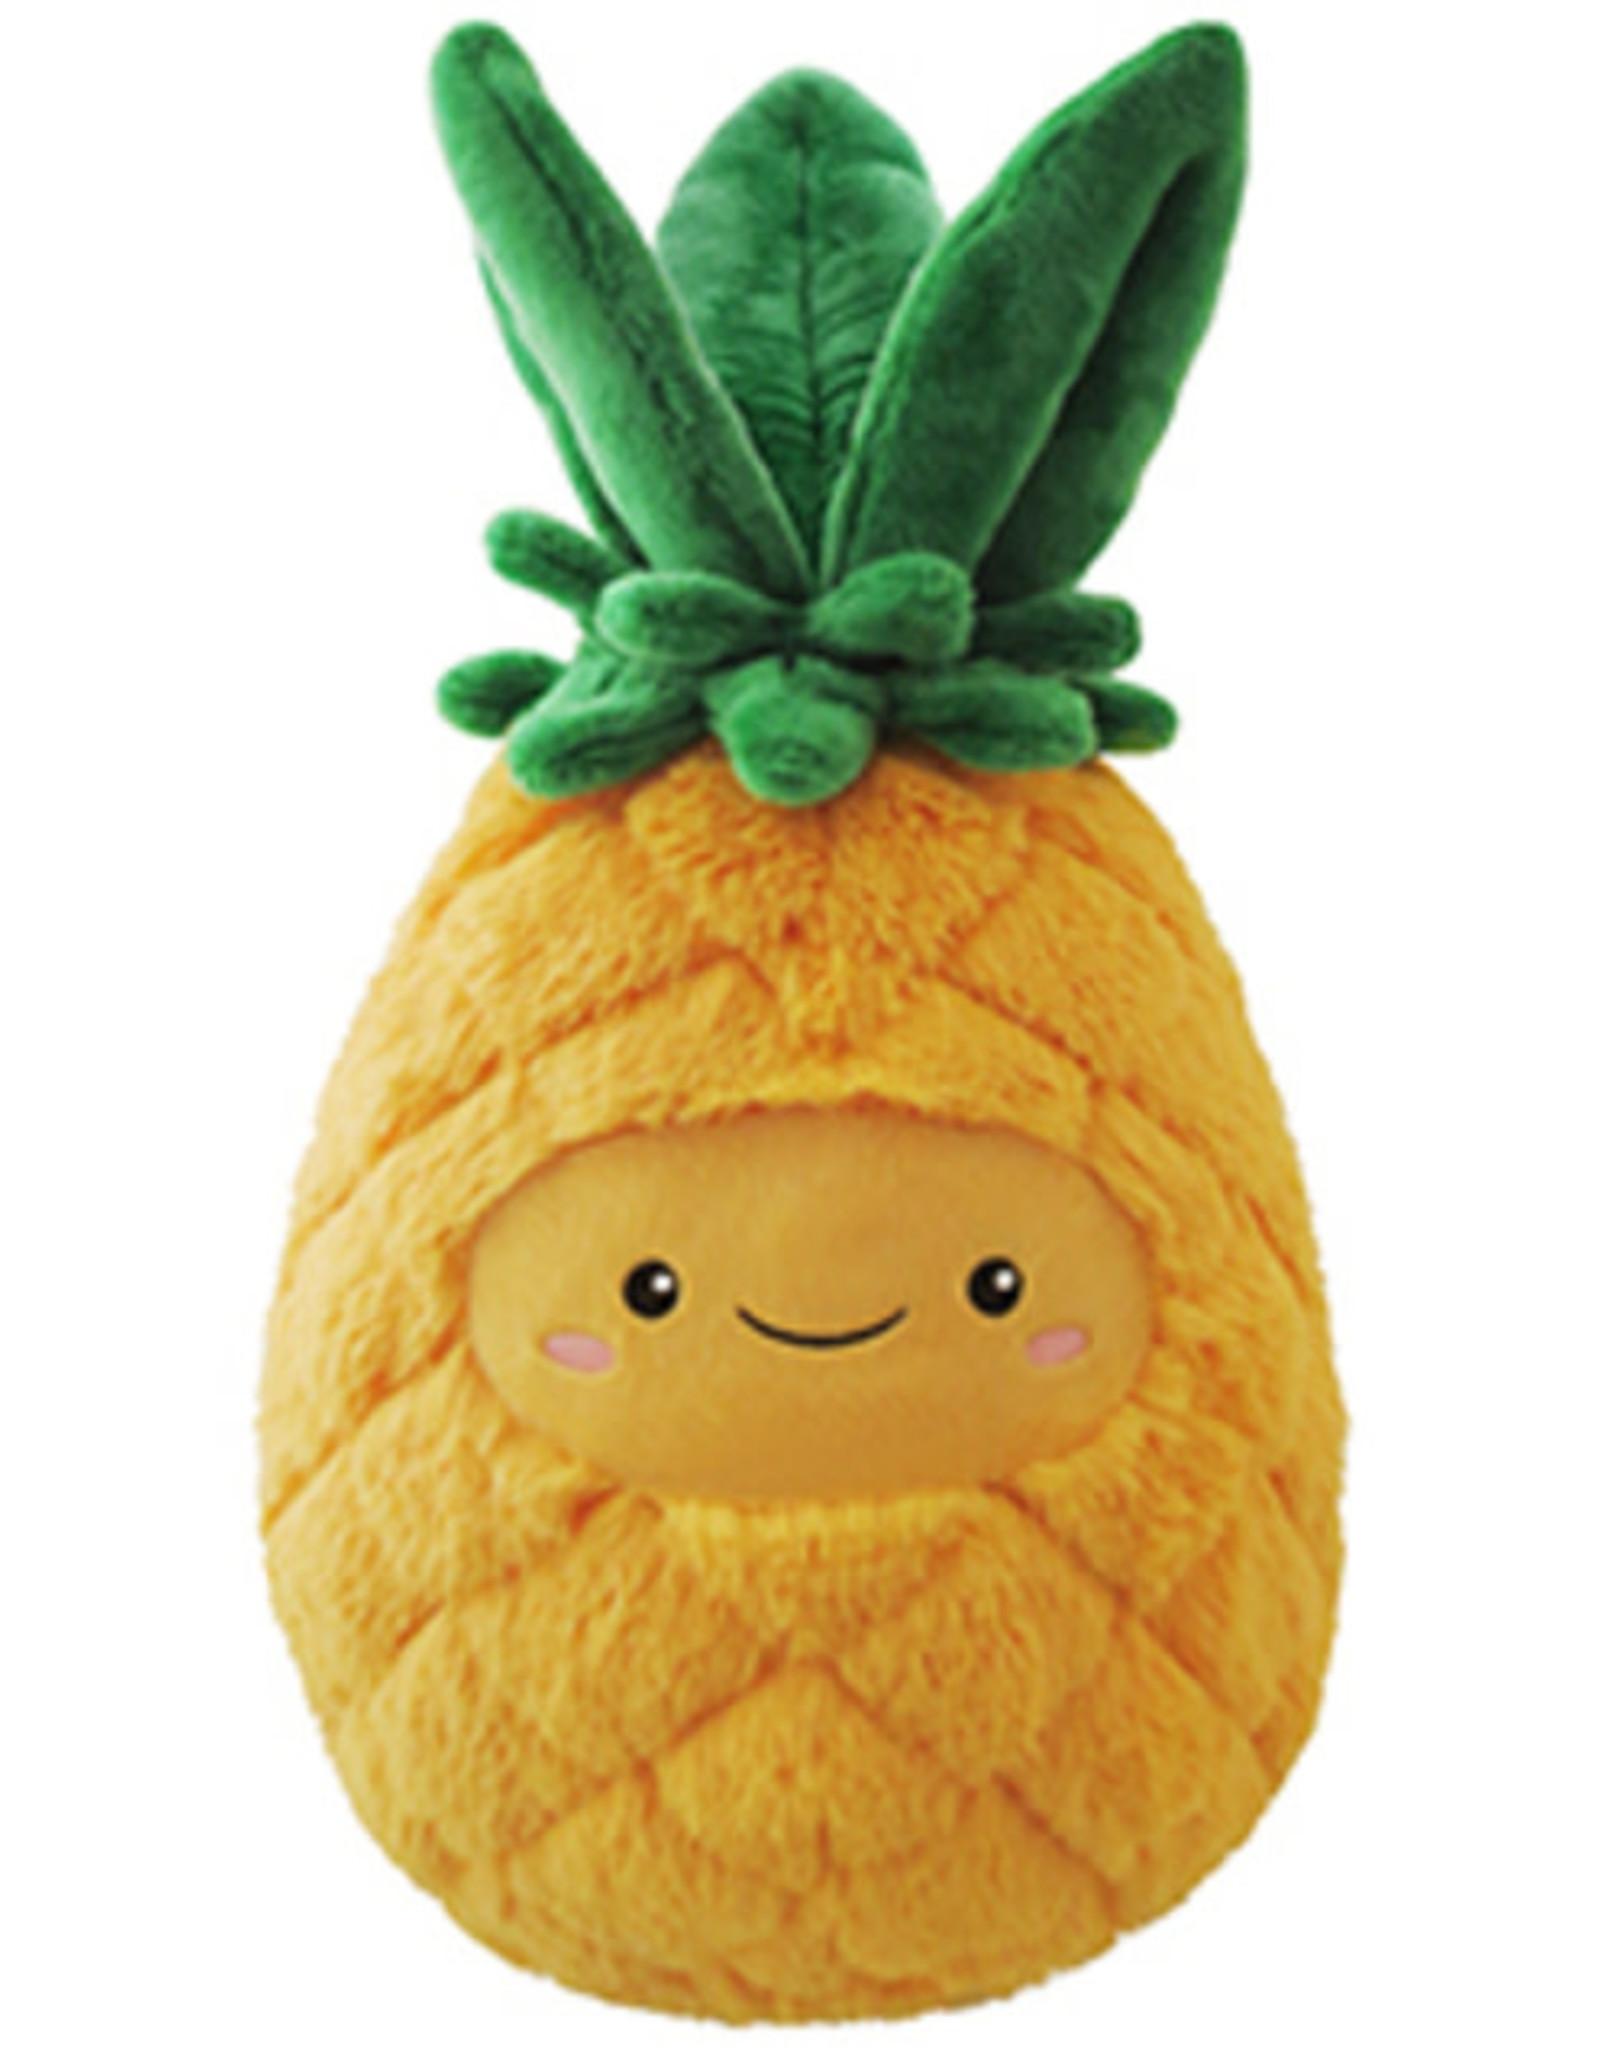 Squishable Comfort Food Pineapple